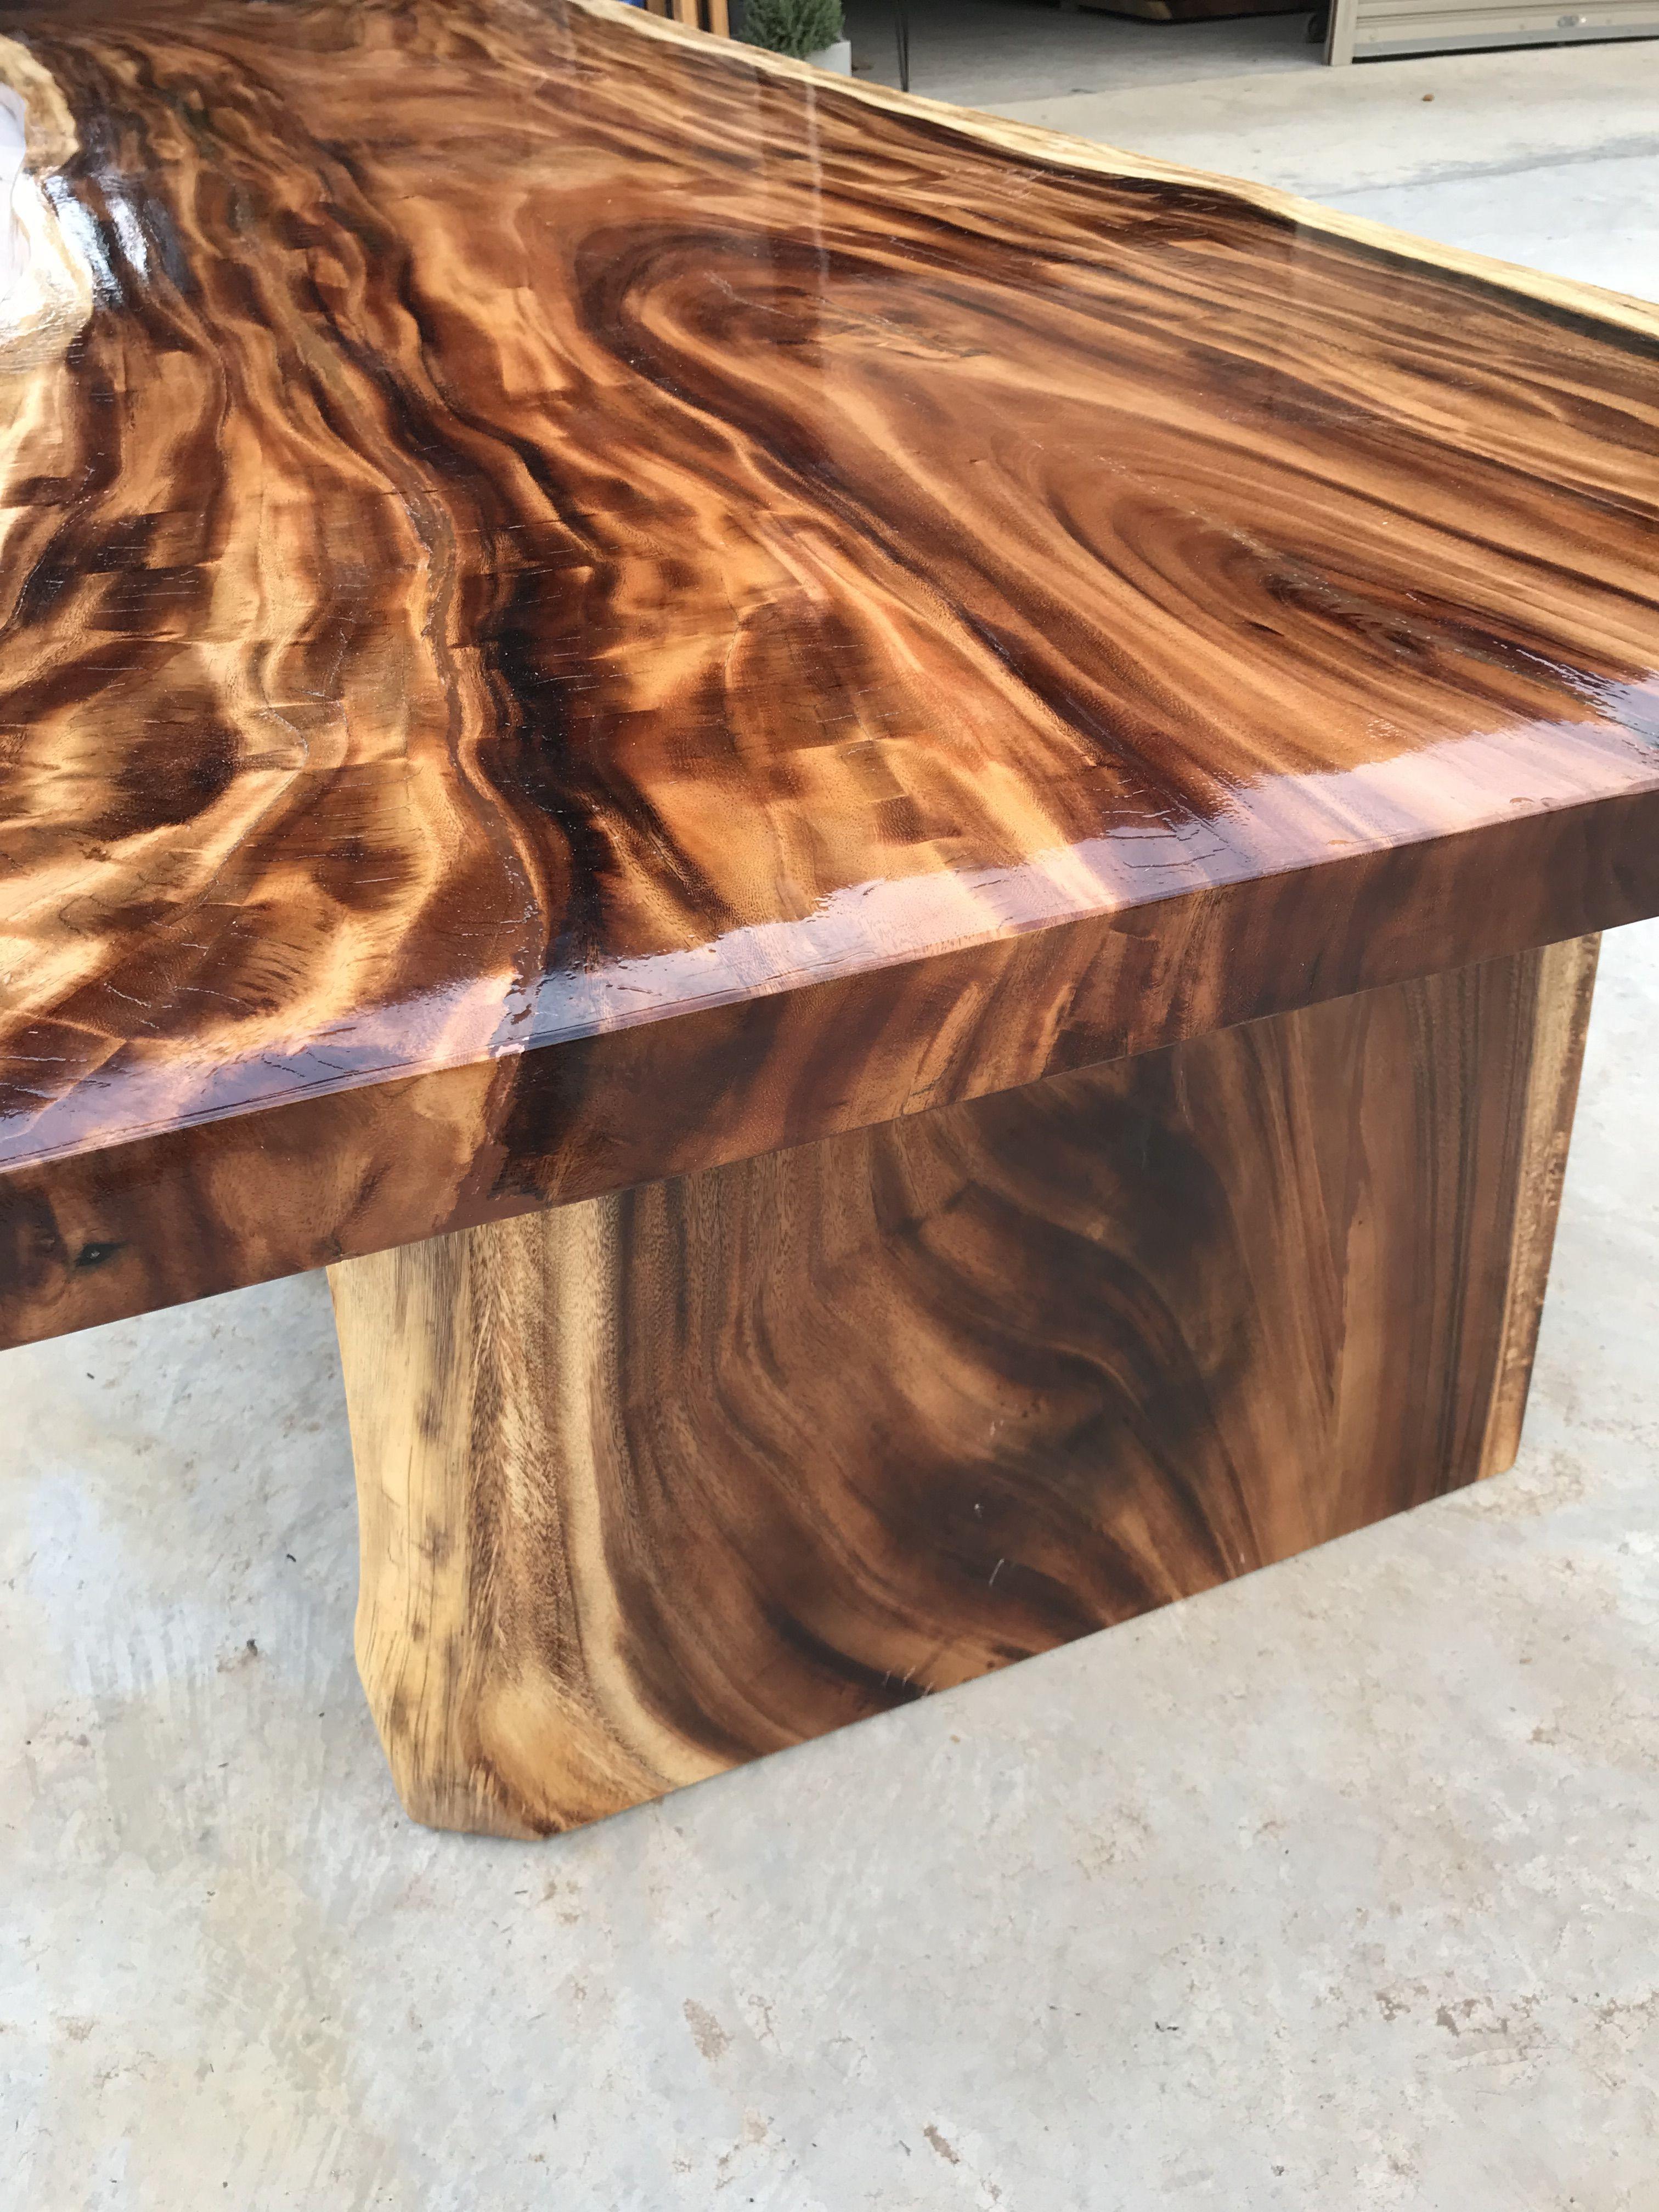 Live Edge Dining Table Reclaimed Single Slab Conference Etsy In 2020 Wood Slab Table Live Edge Dining Table Wood Slab Dining Room Table